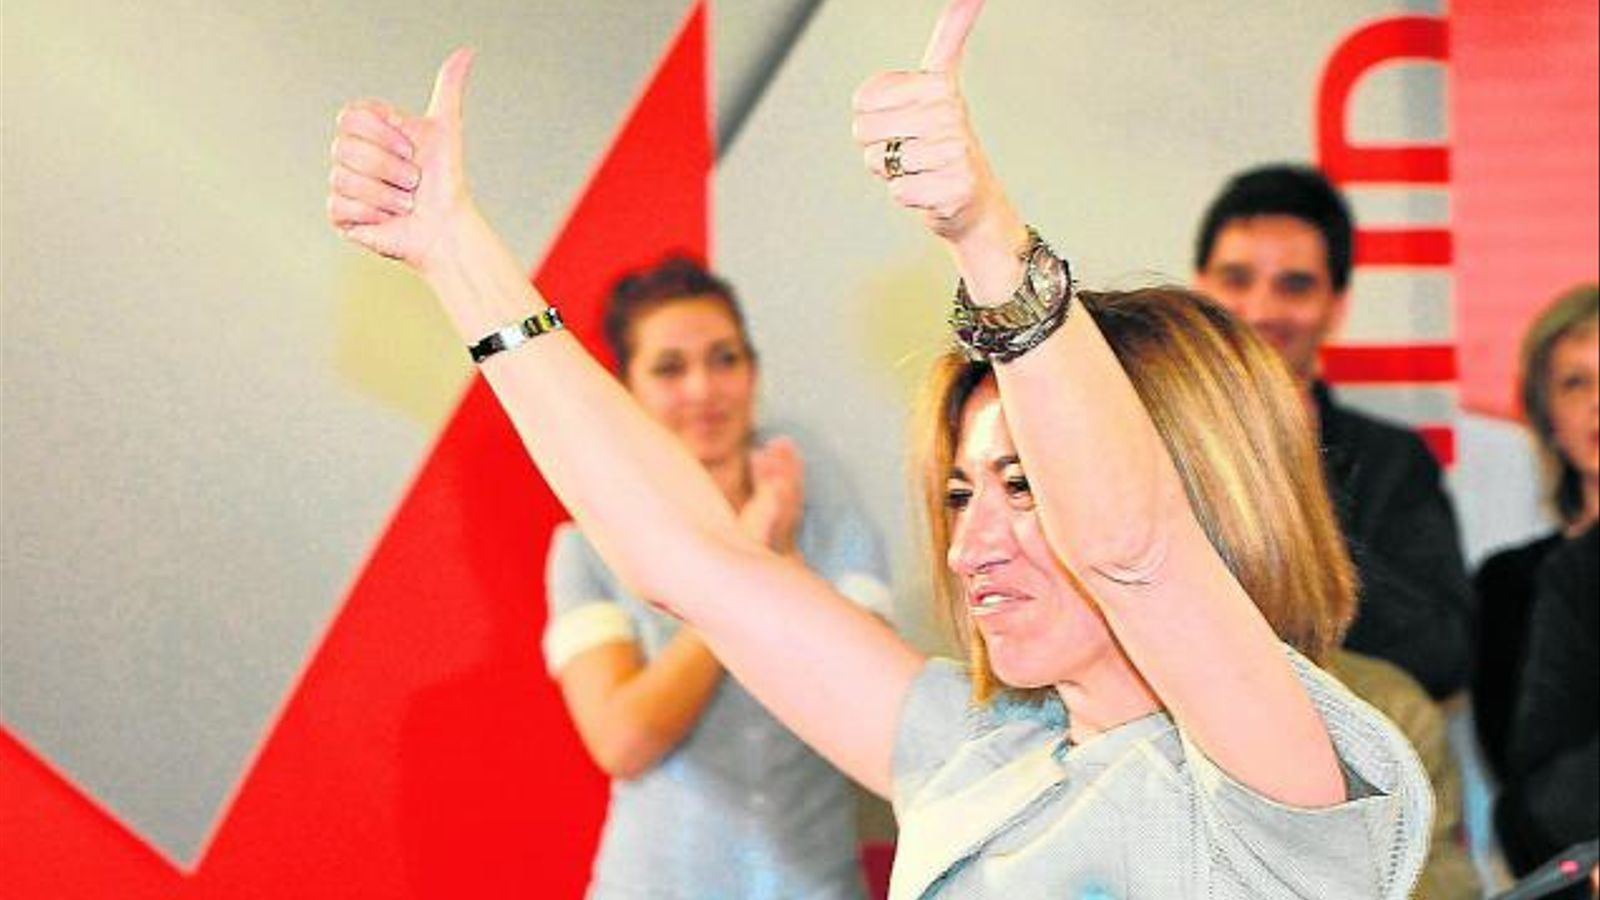 Chacón fa seva l'herència de ZP contra un Rajoy gandul